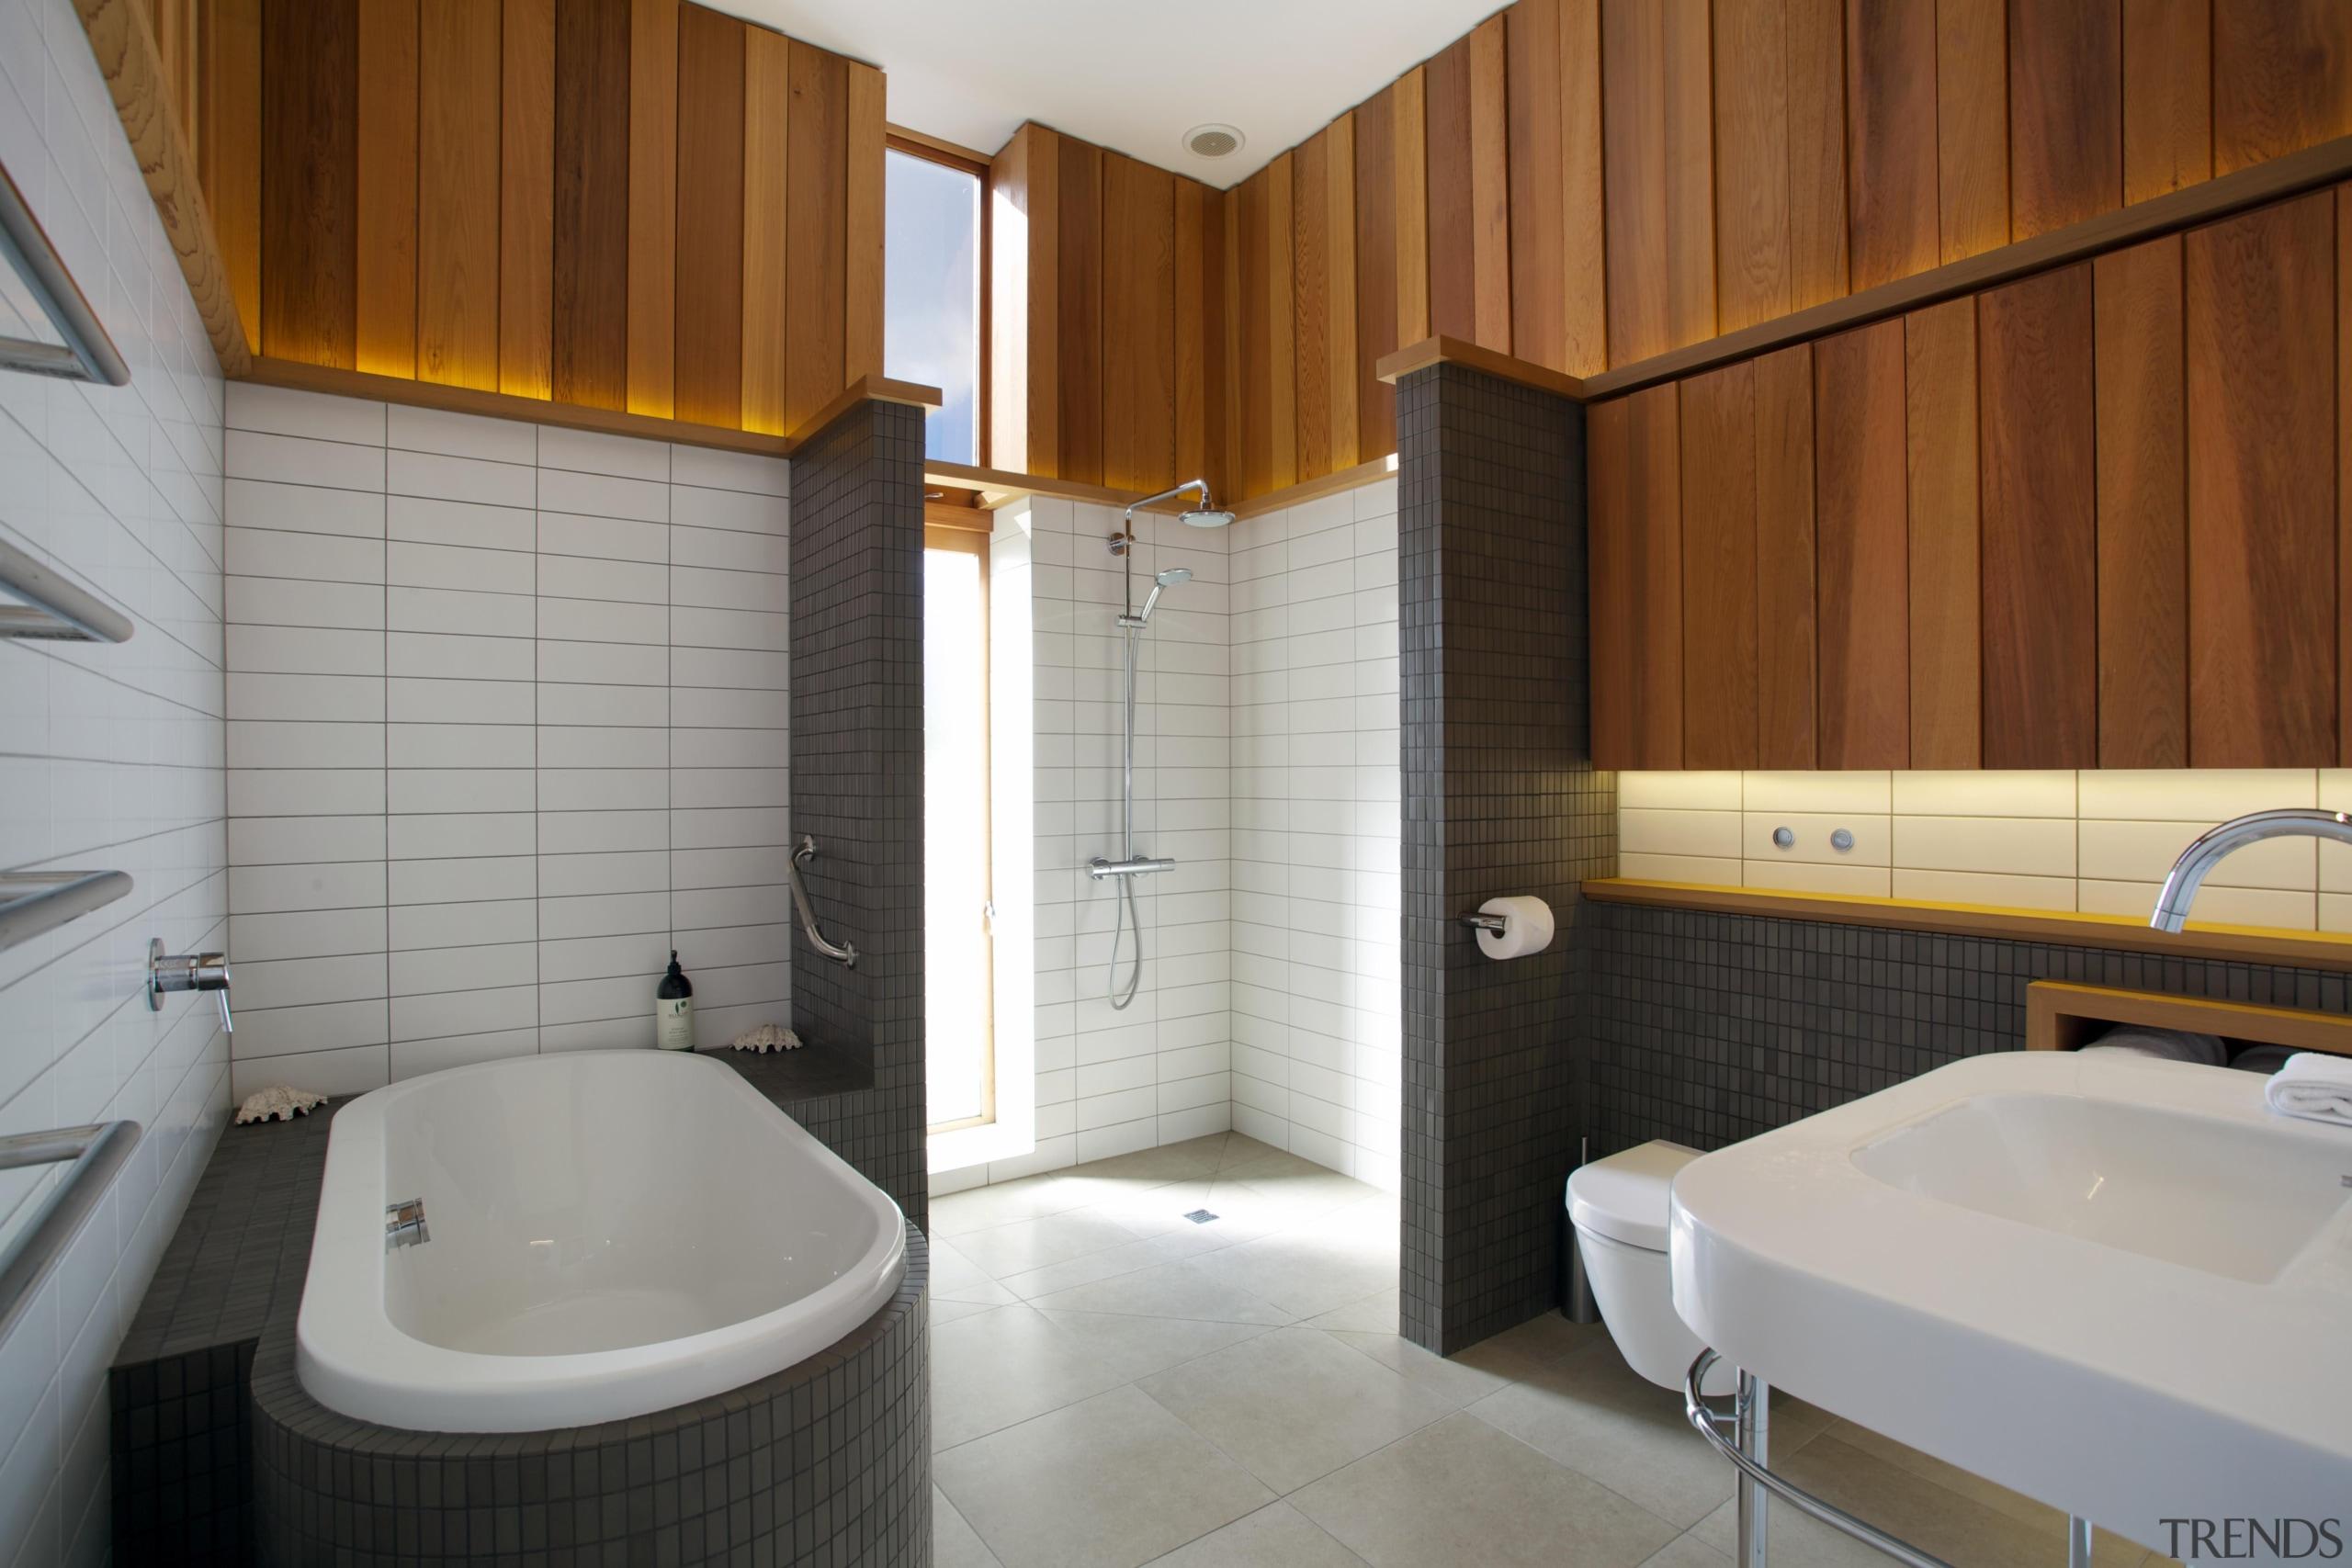 Fraser Cameron Architects –Winner - 2015 Trends International architecture, bathroom, floor, interior design, property, real estate, room, tile, gray, brown